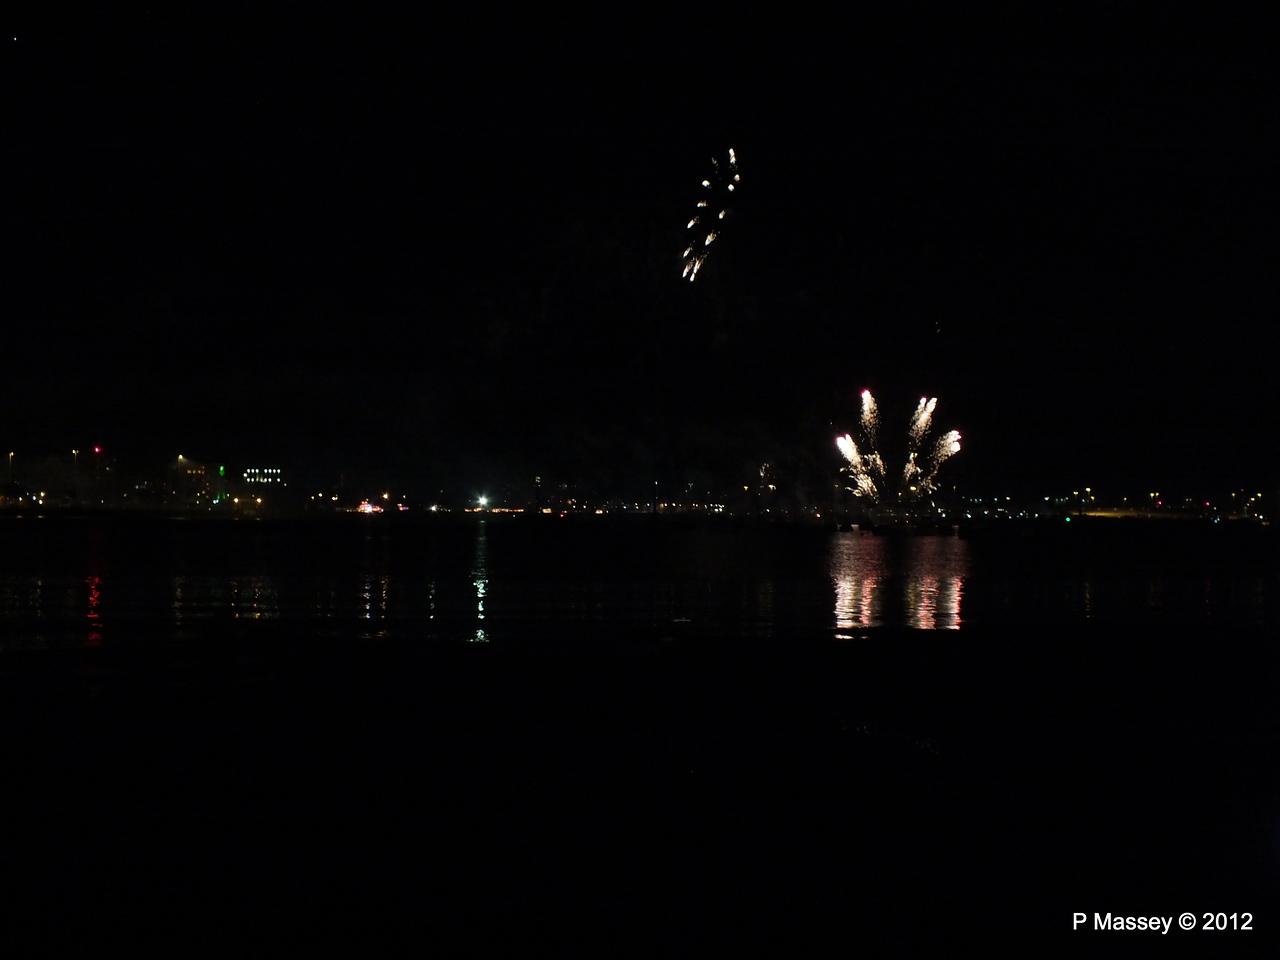 Fireworks off Mayflower Park PDM 03-11-2012 20-44-31